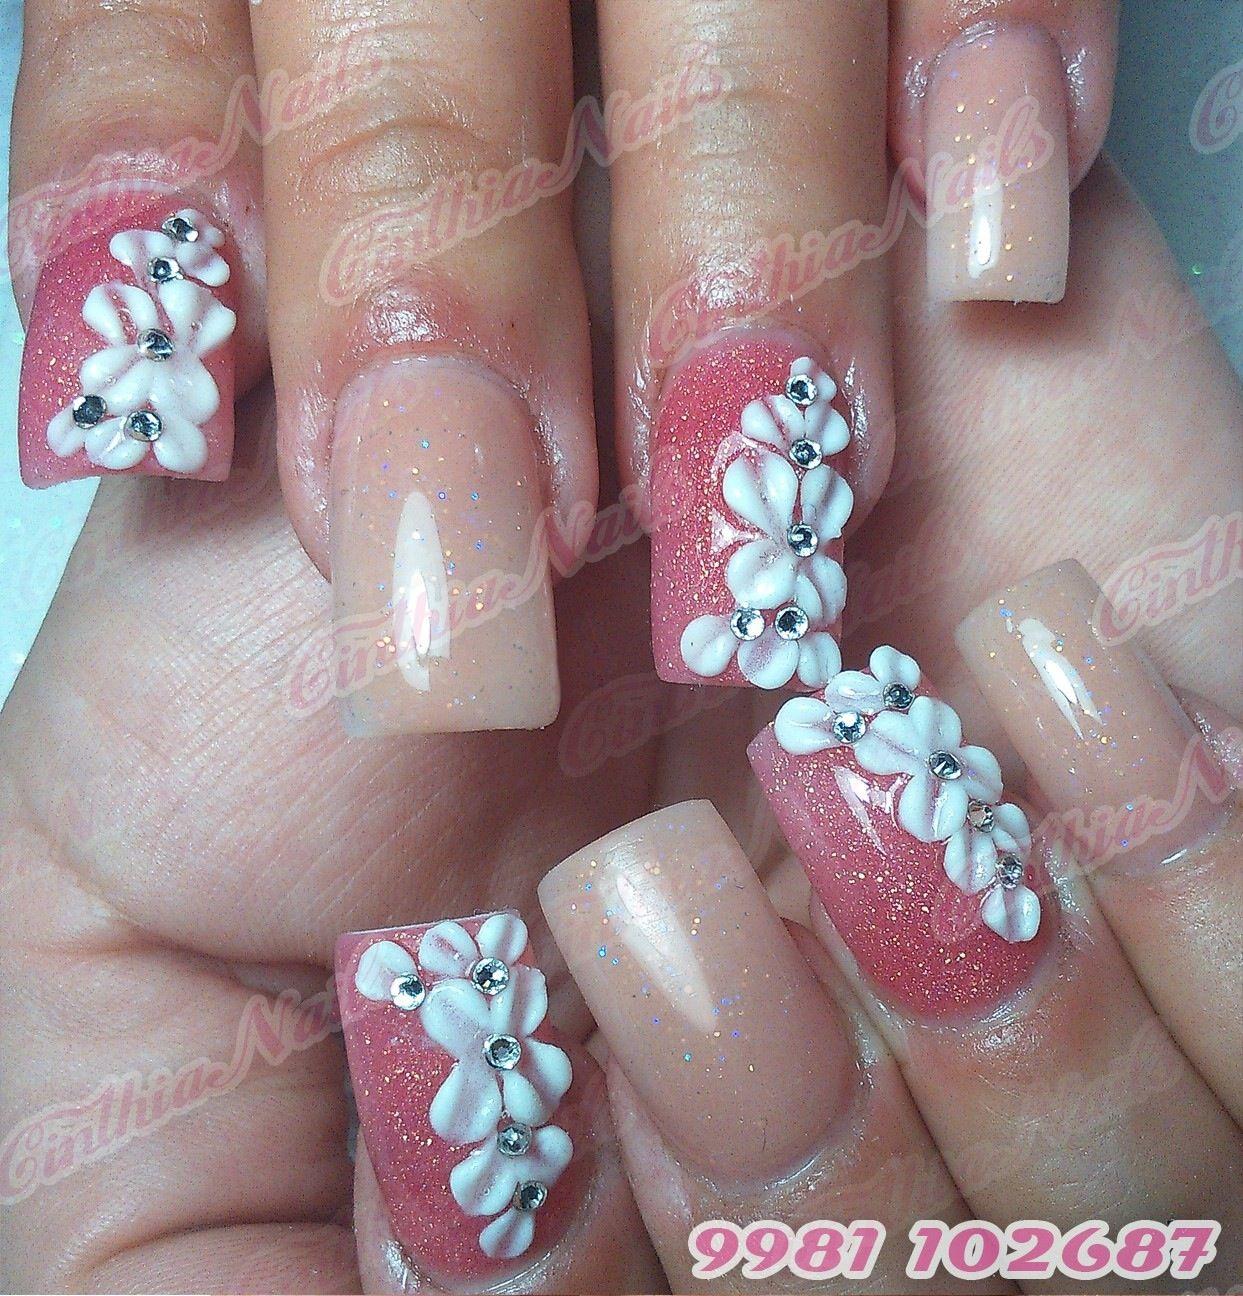 Modern Diva Nails Edina Photos - Nail Art Ideas - morihati.com